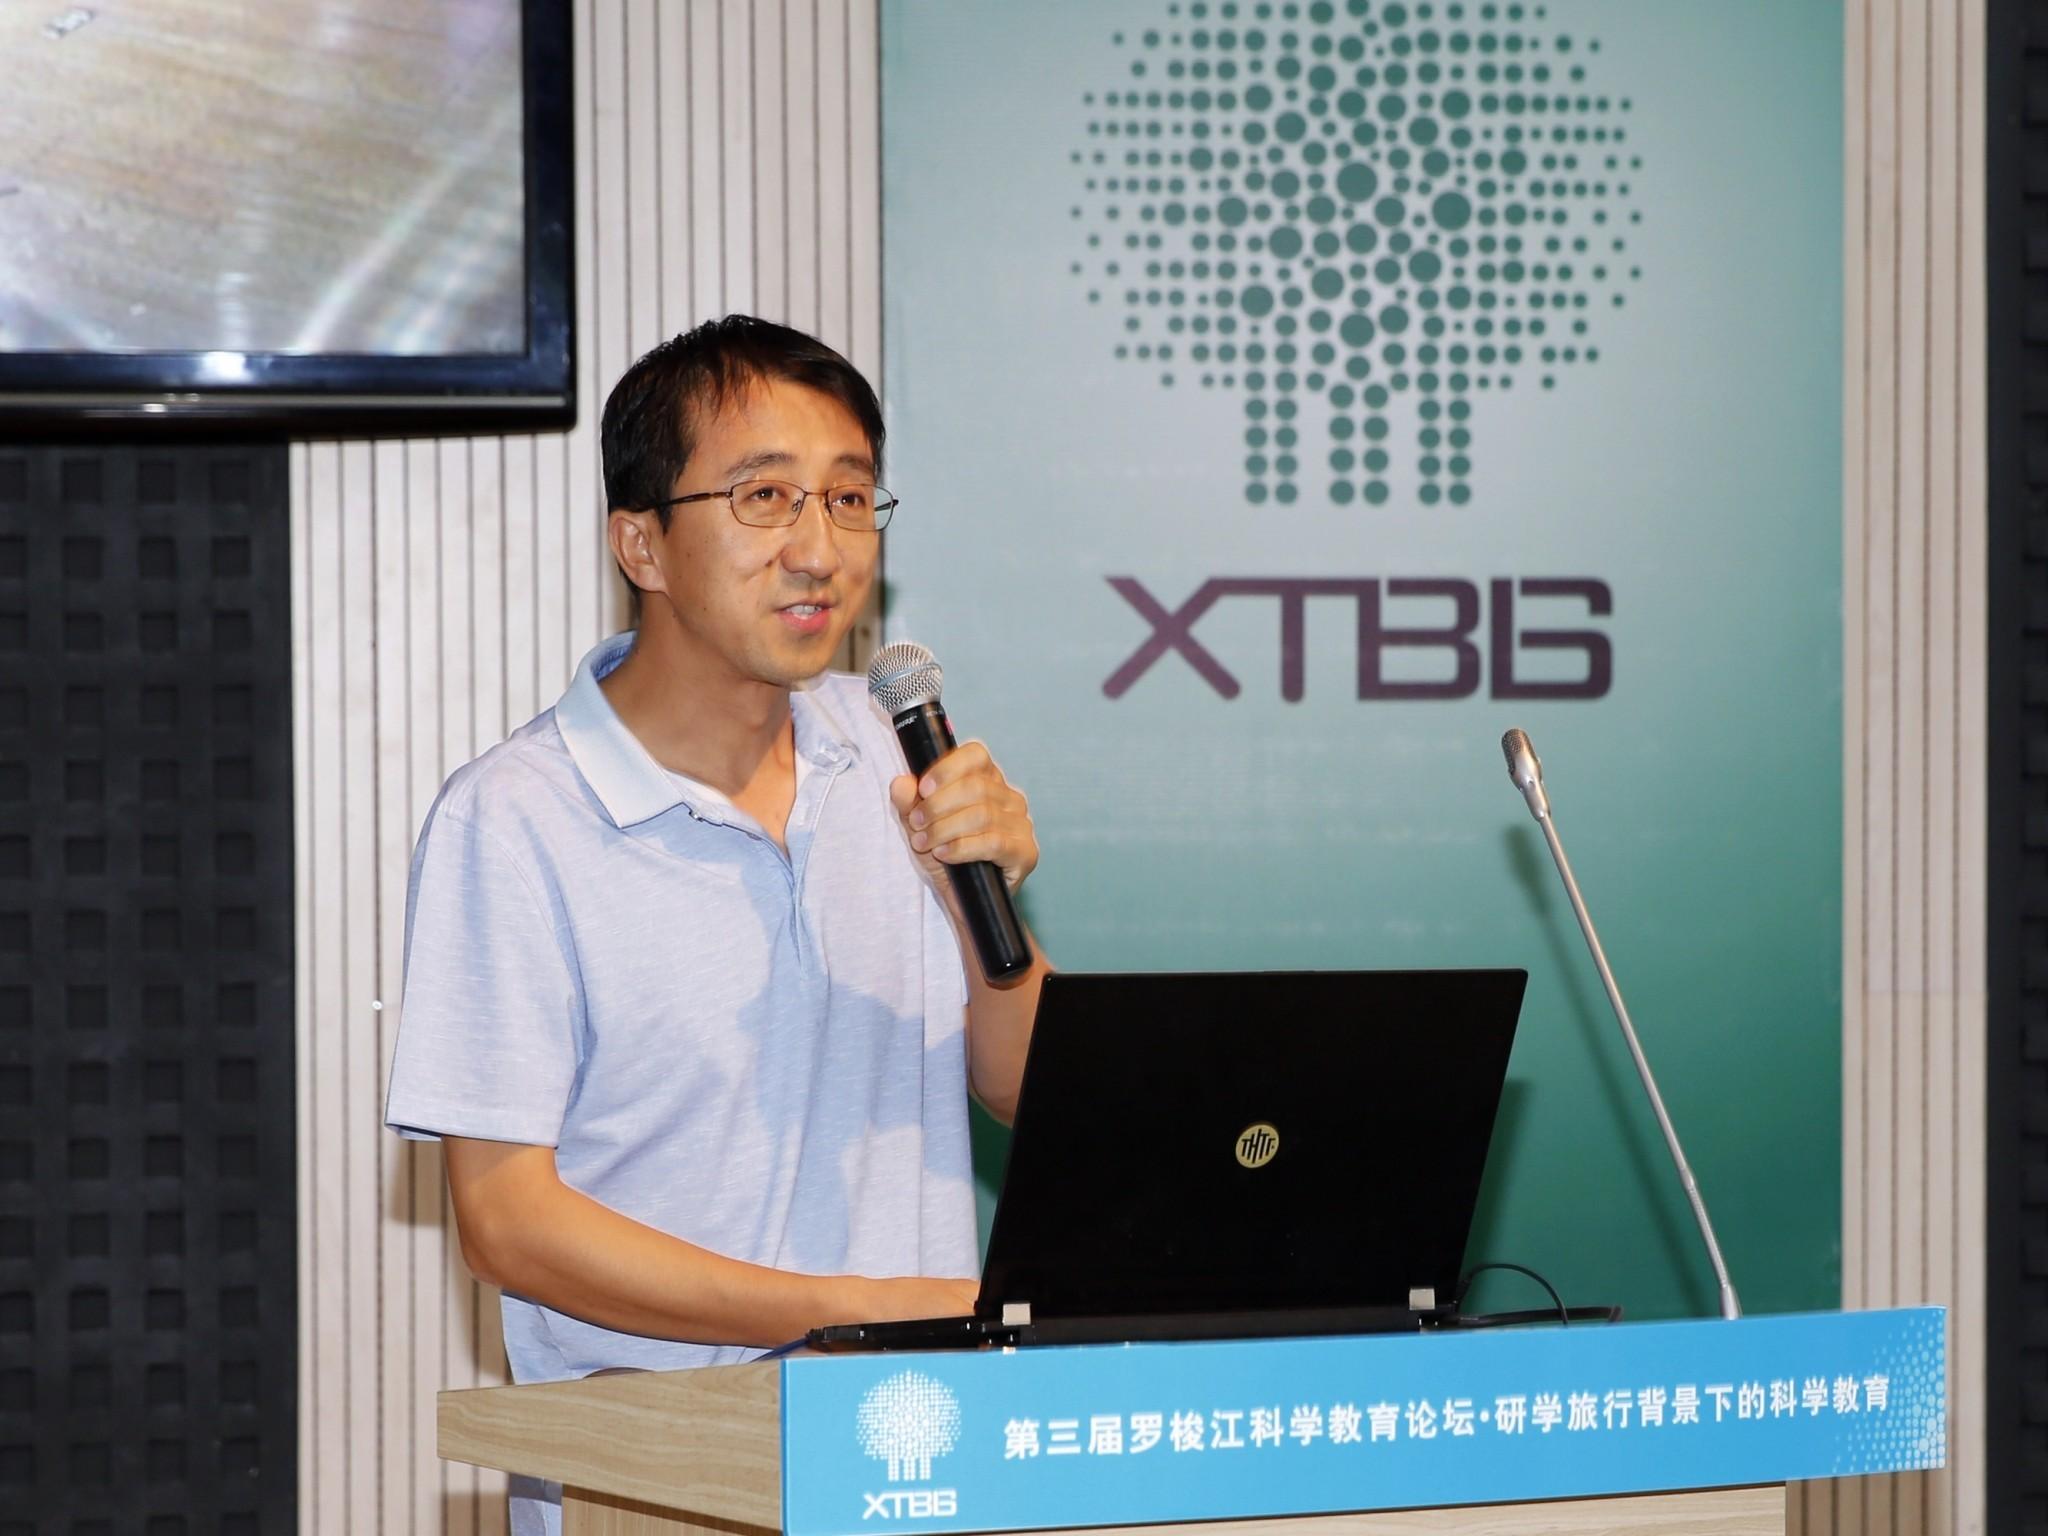 【Pecha kucha】中国地震局地球物理研究所 王红强:小小地震学家养成记